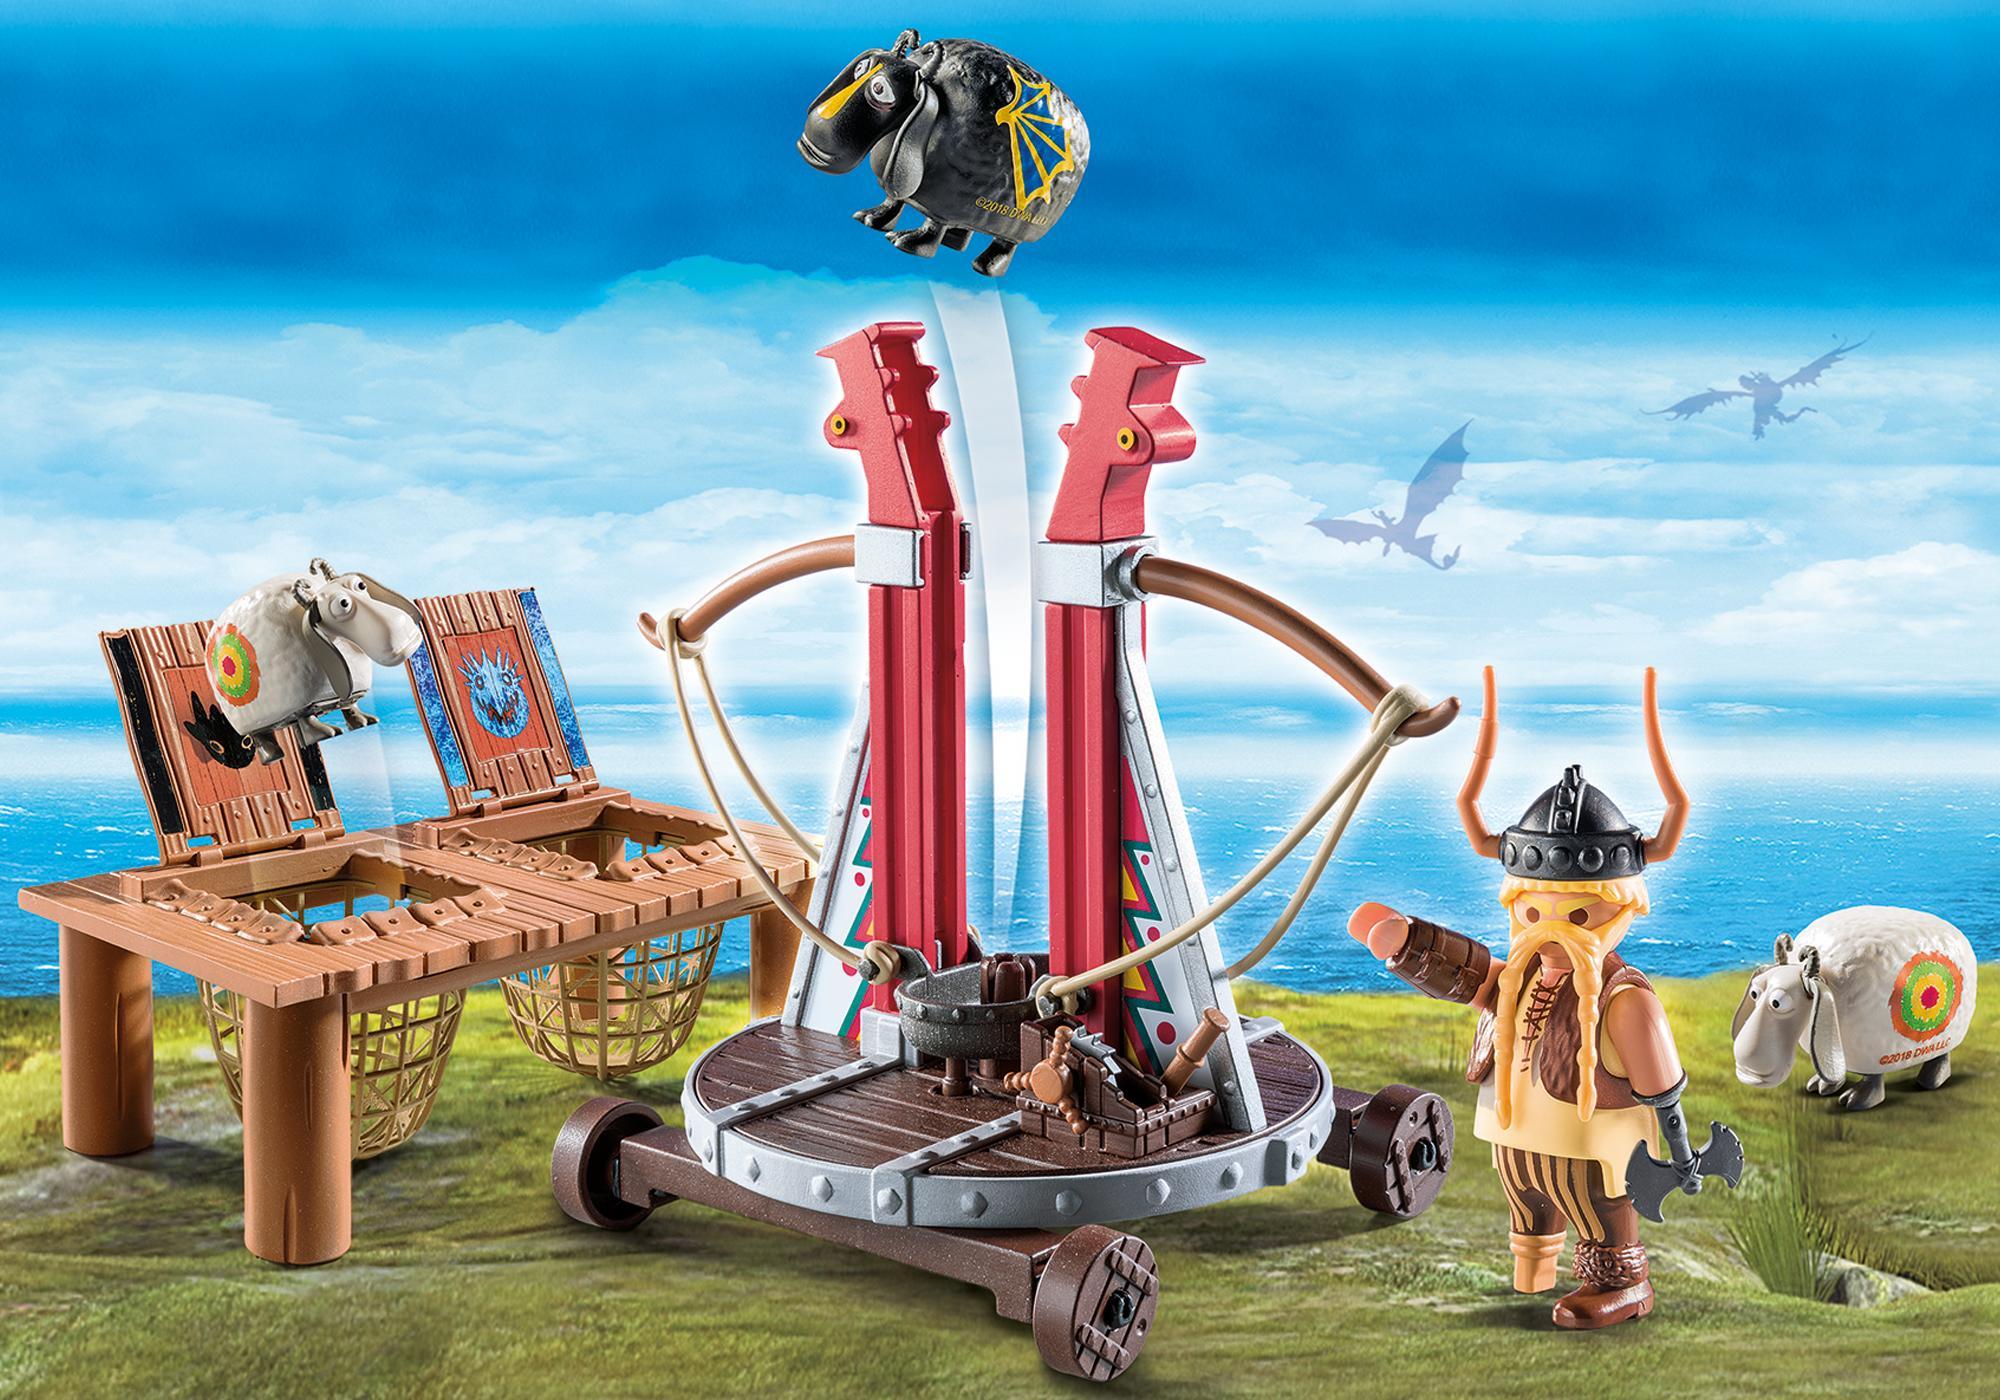 http://media.playmobil.com/i/playmobil/9461_product_detail/Grobian mit Schafschleuder